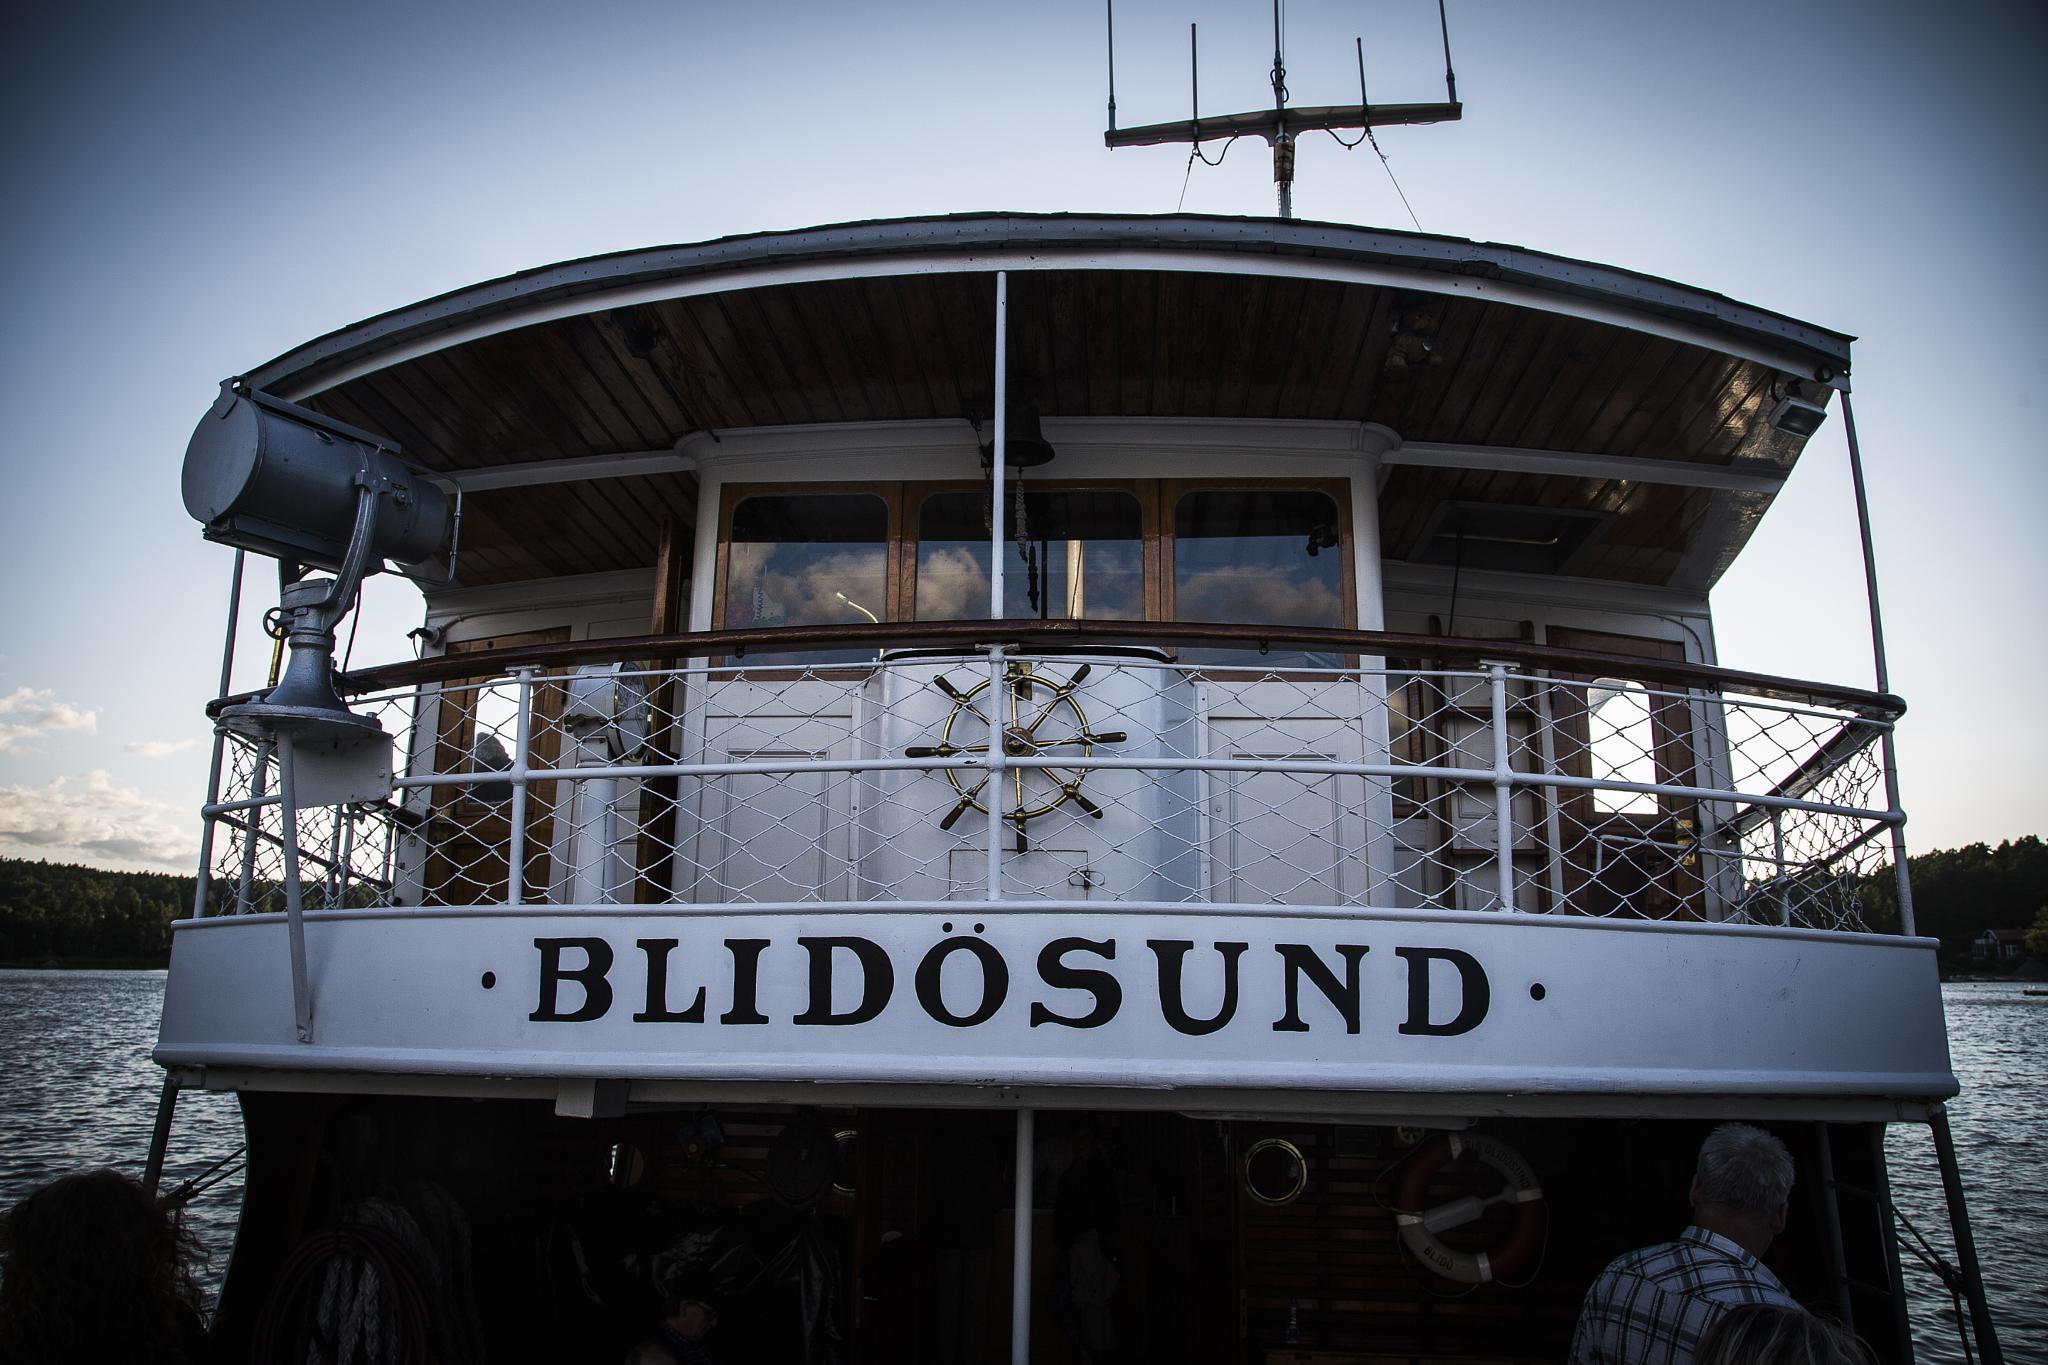 S/S Blidösund by gerry.askefalk